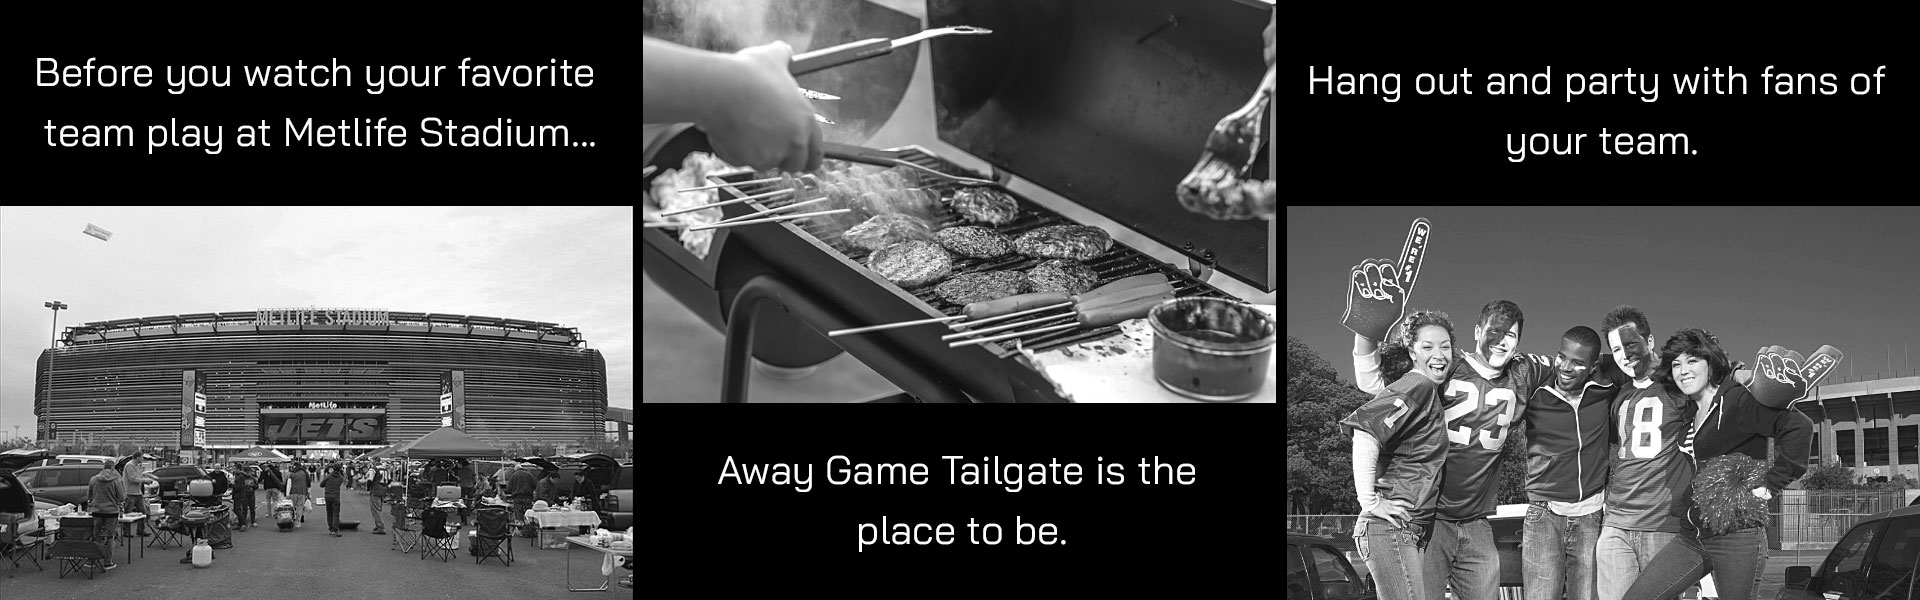 away-game-tailgate-slider